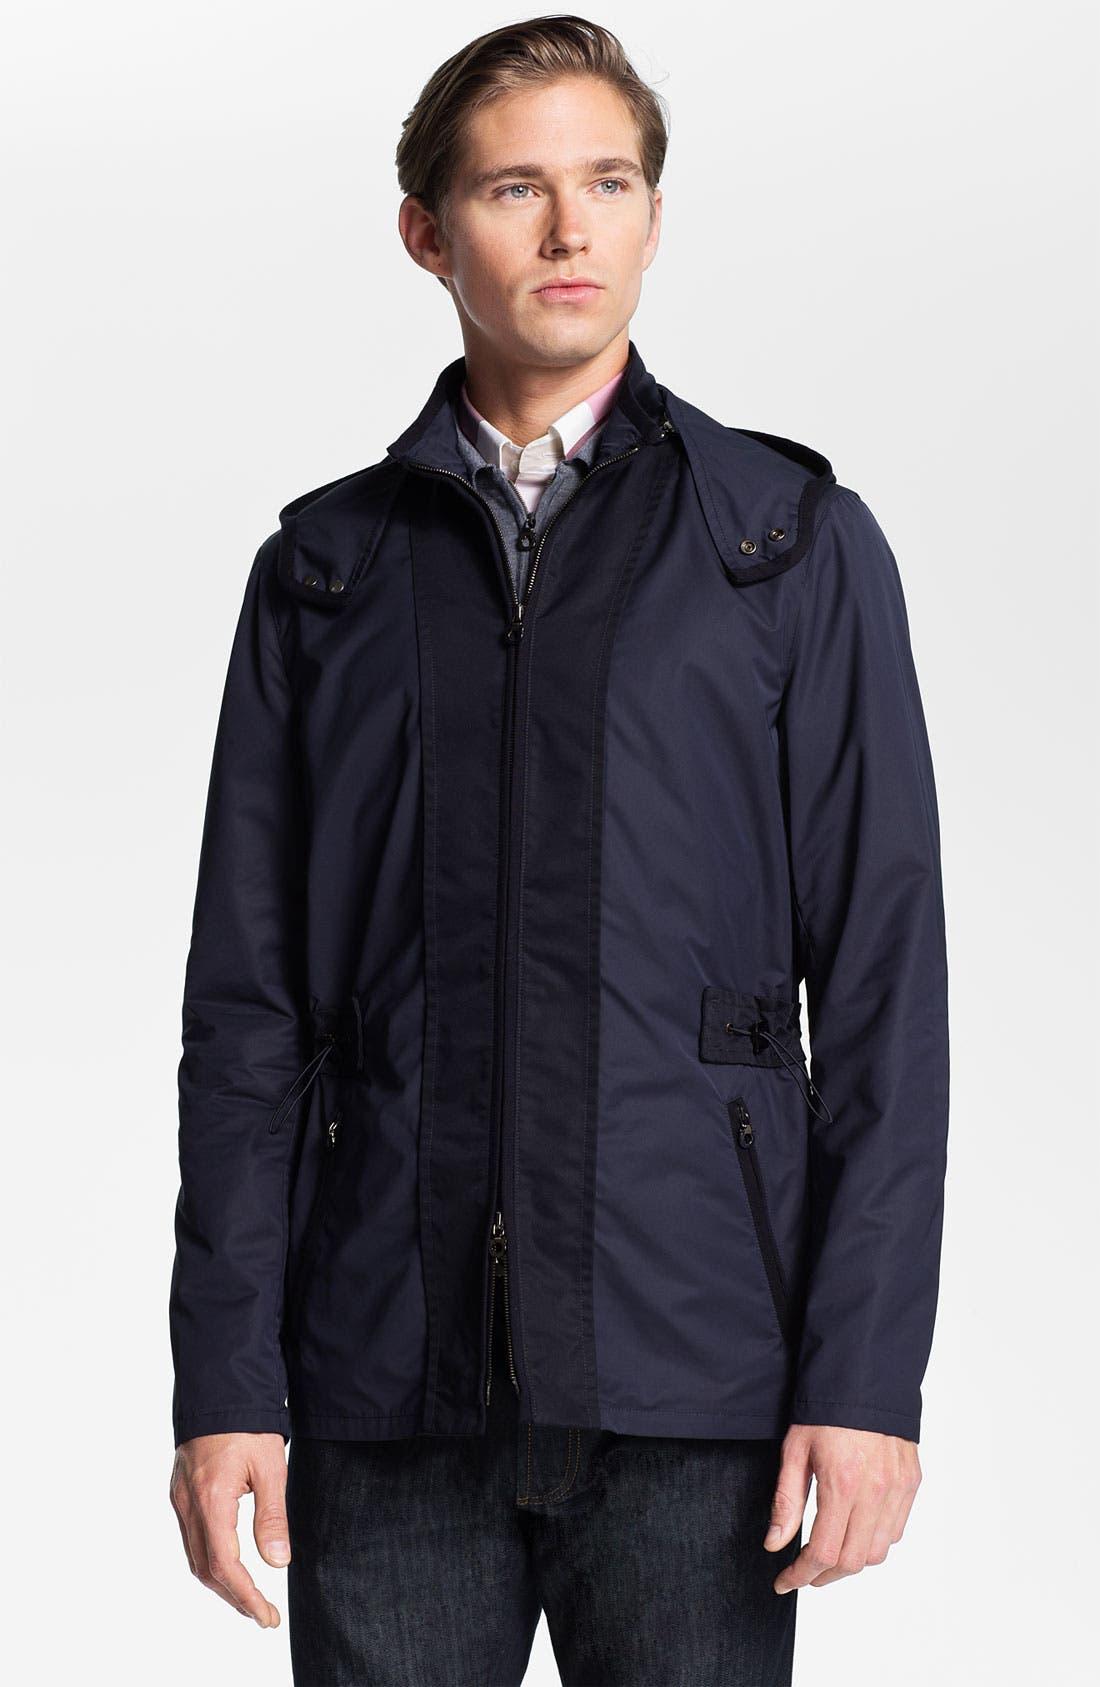 Alternate Image 1 Selected - Salvatore Ferragamo Hooded Jacket